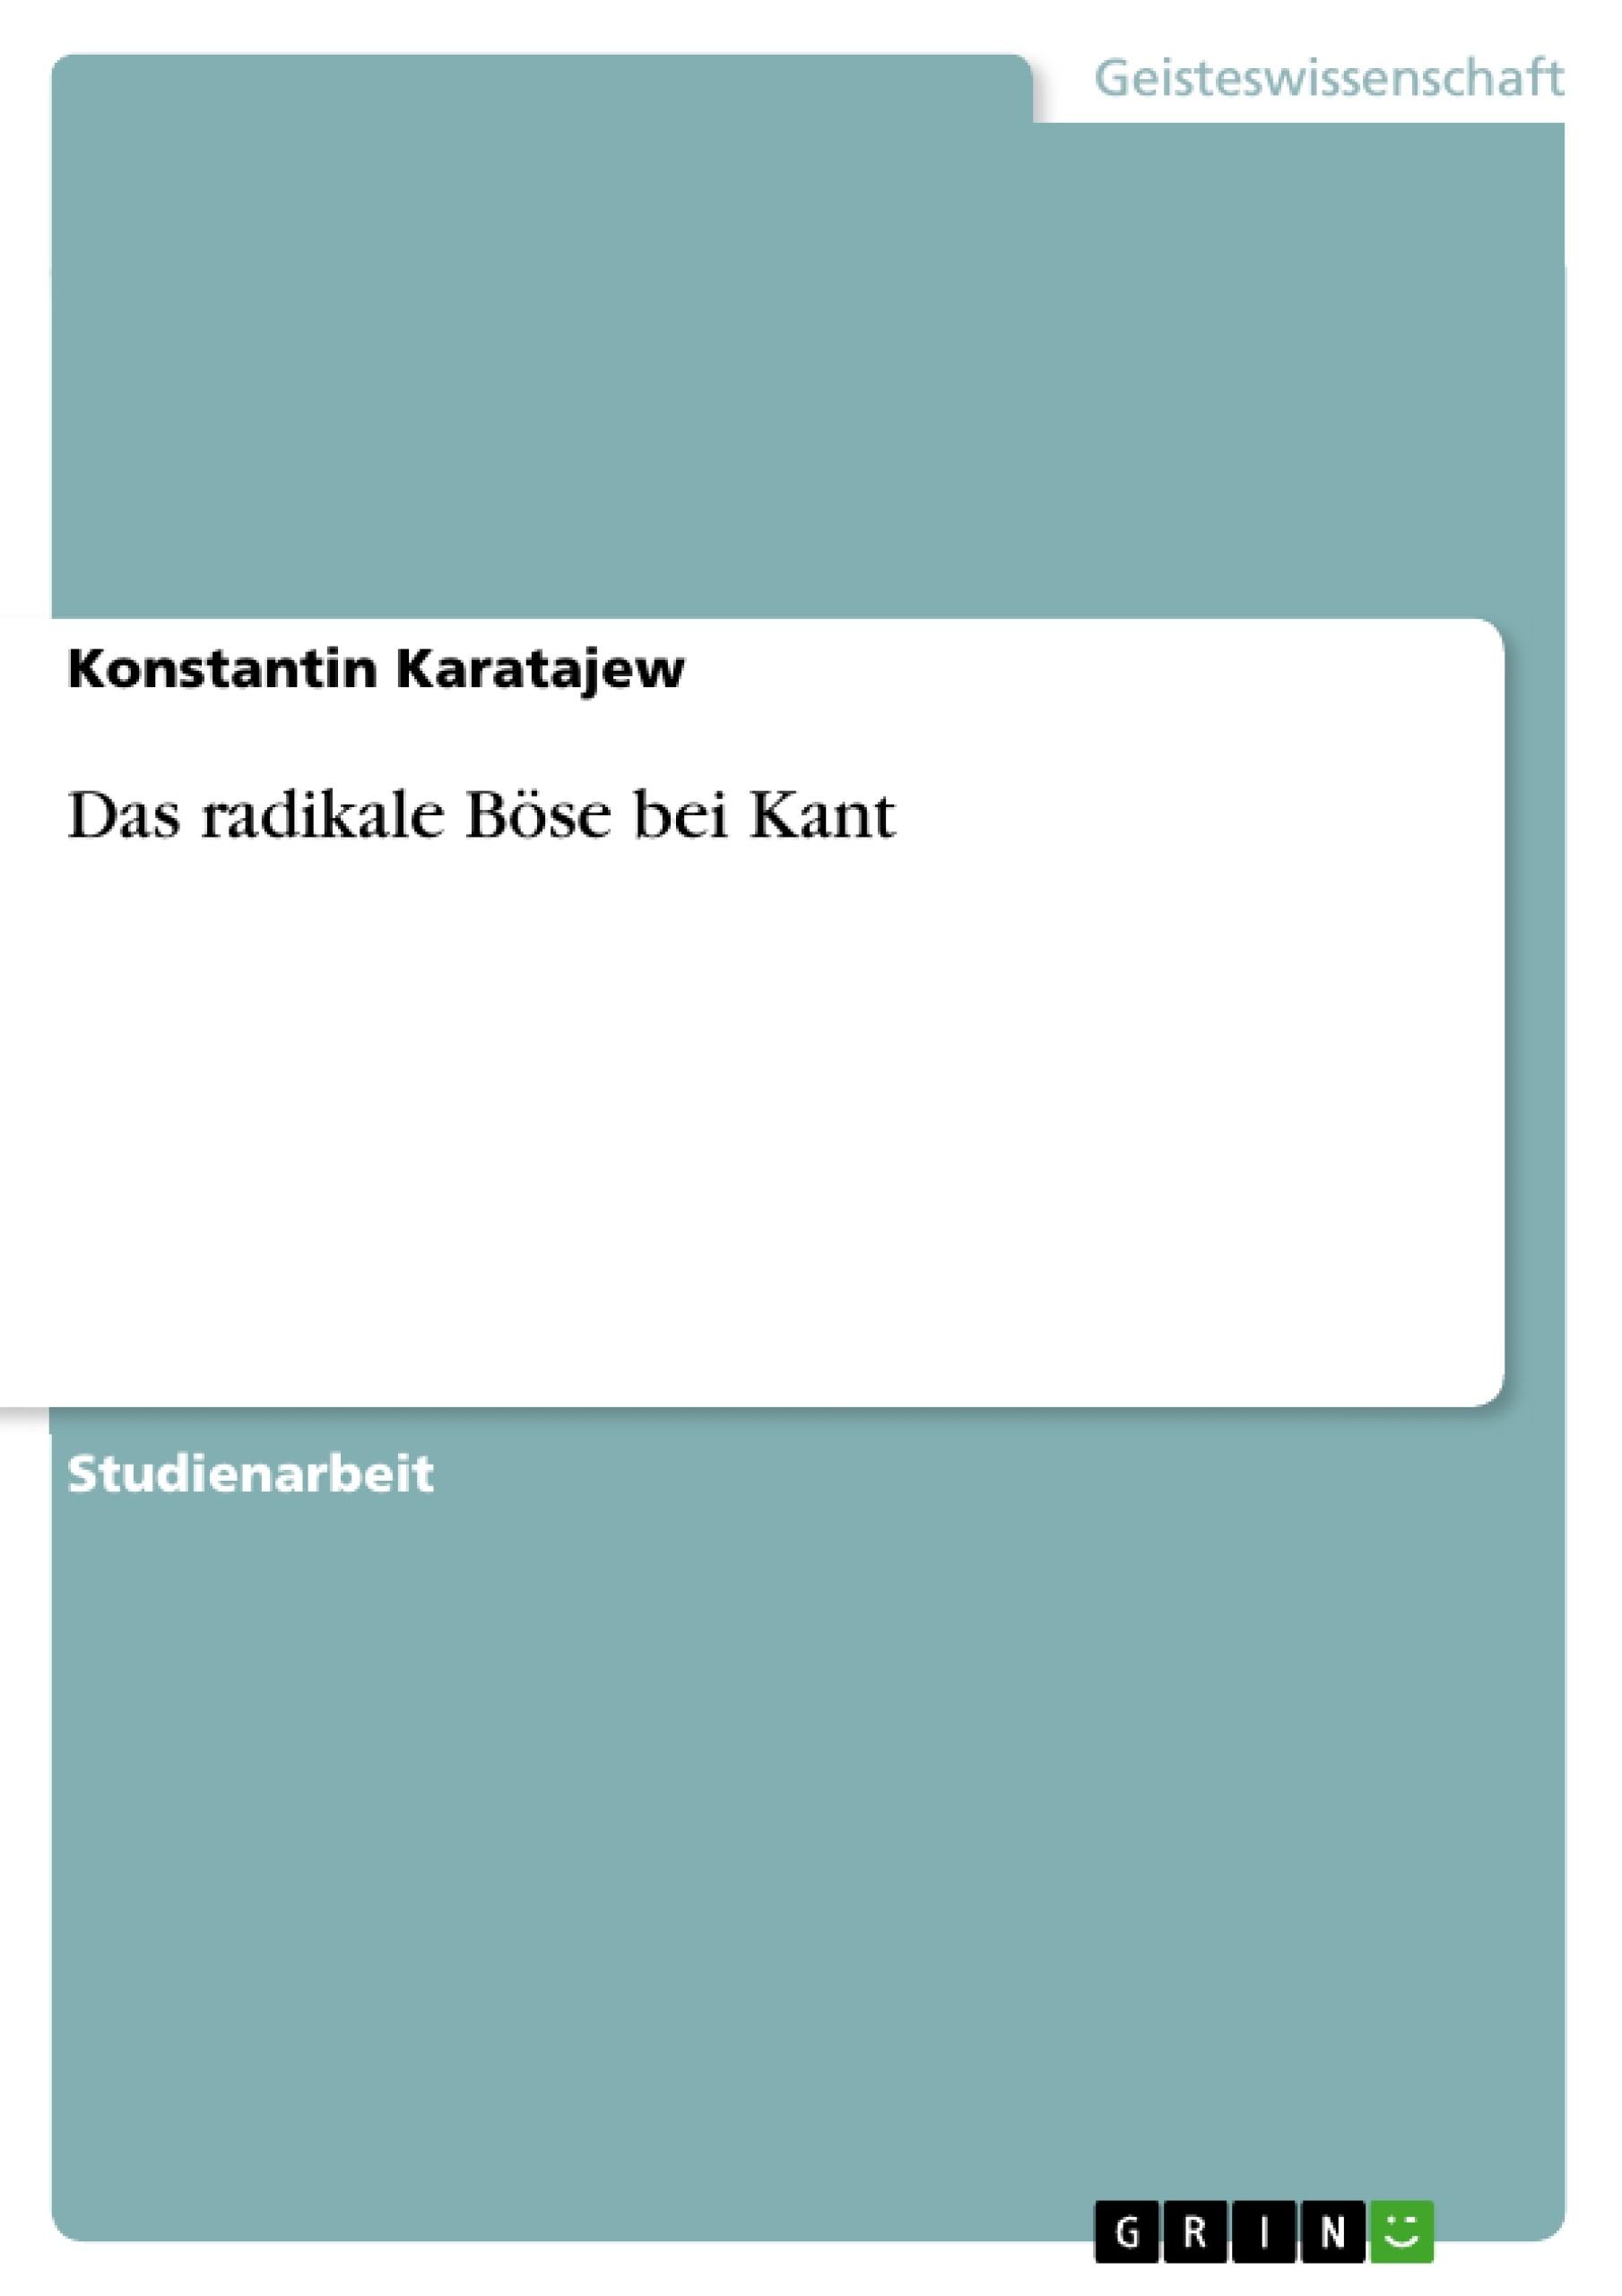 Titel: Das radikale Böse bei Kant